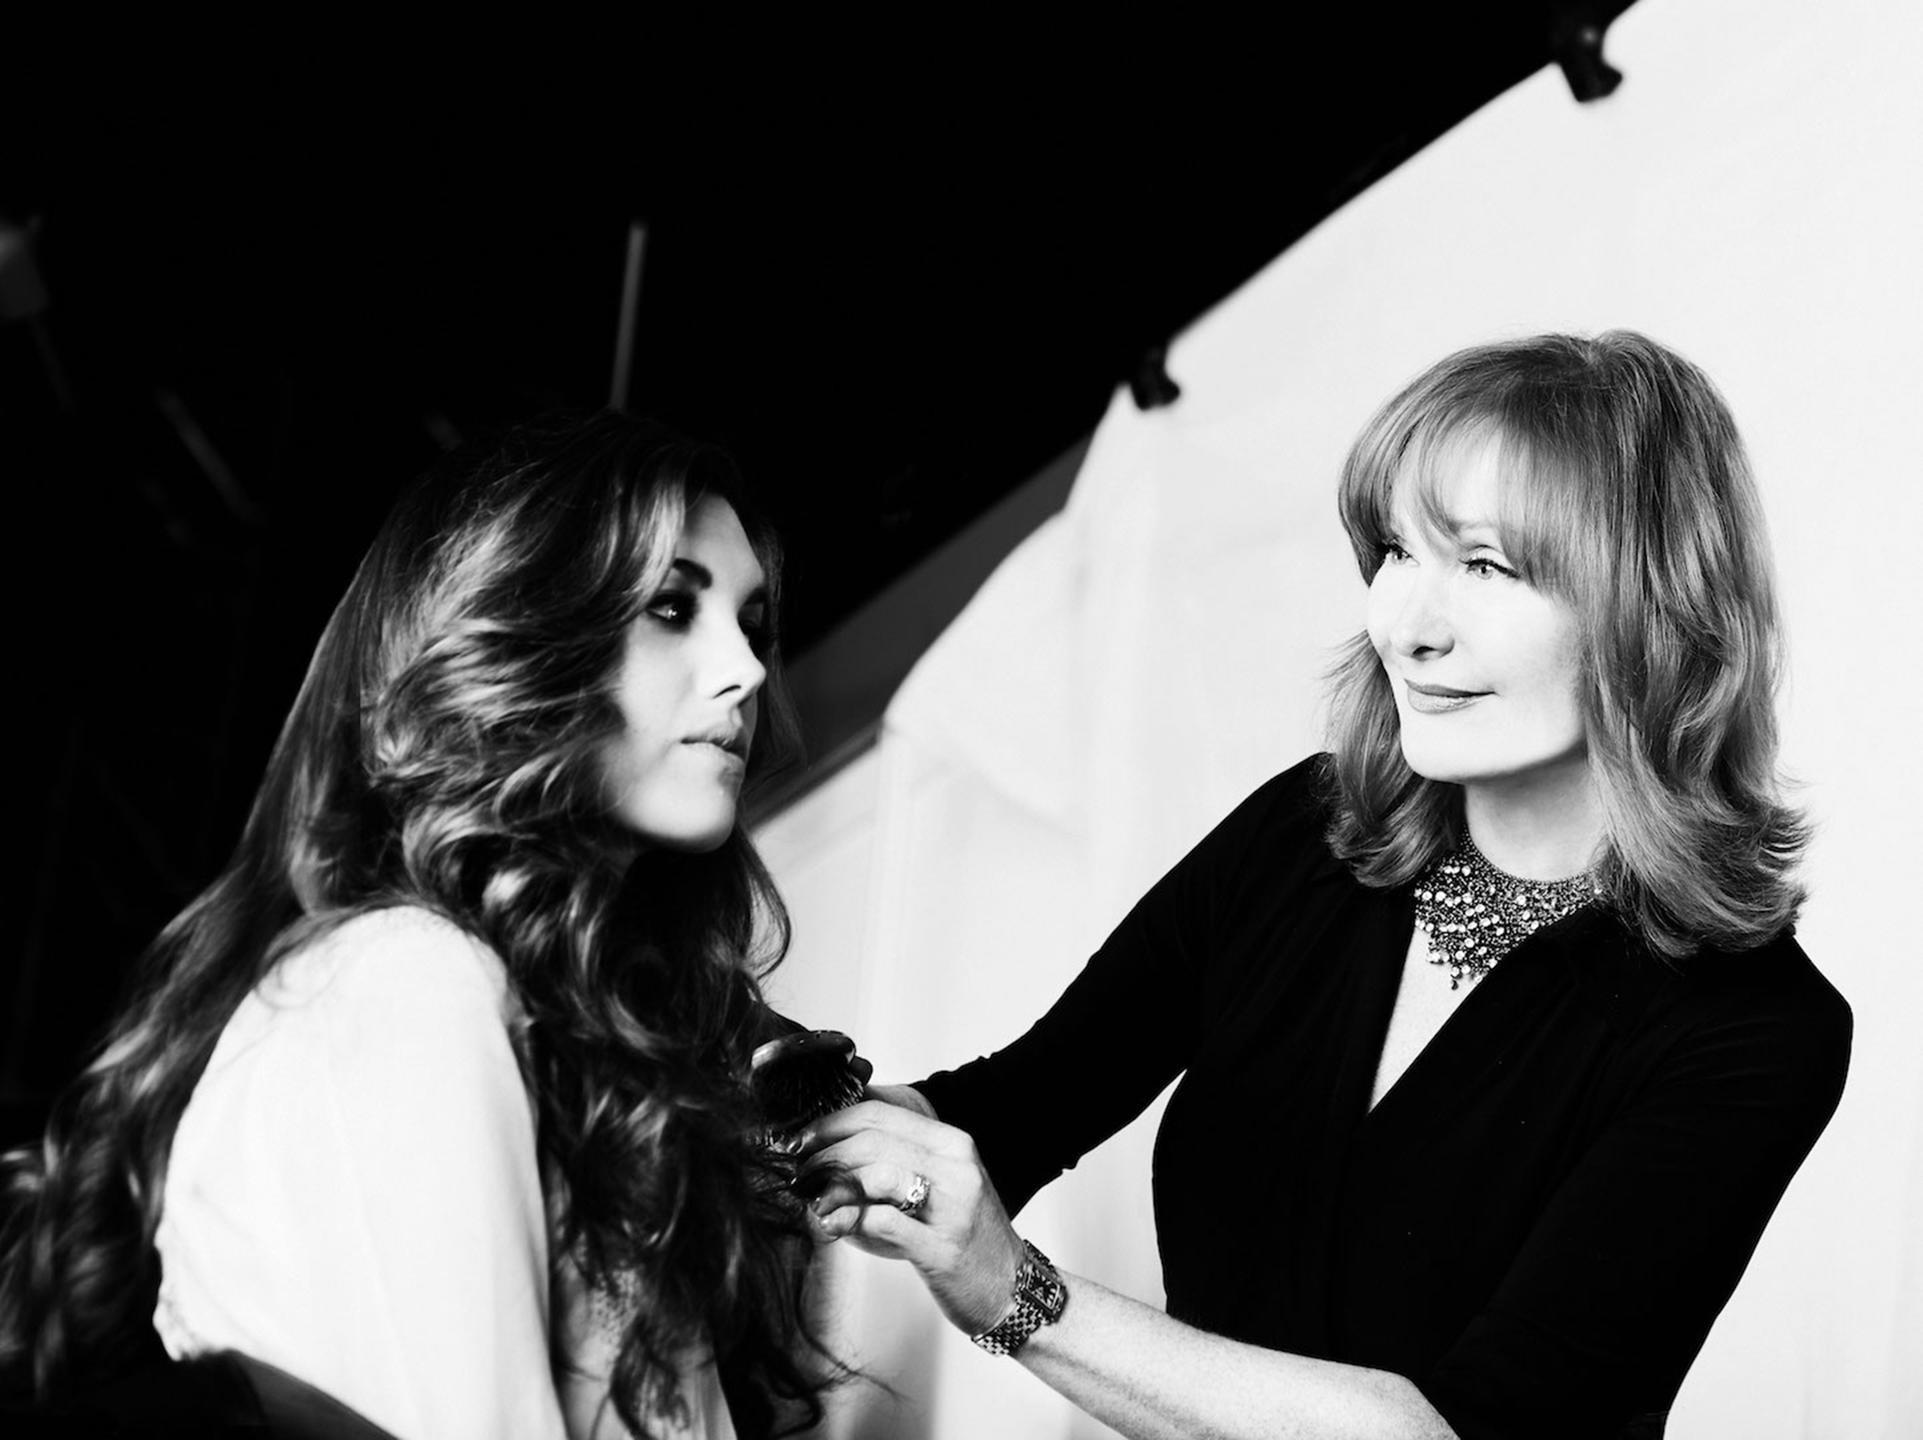 Vivienne Mackinder doing hair on model at photoshoot